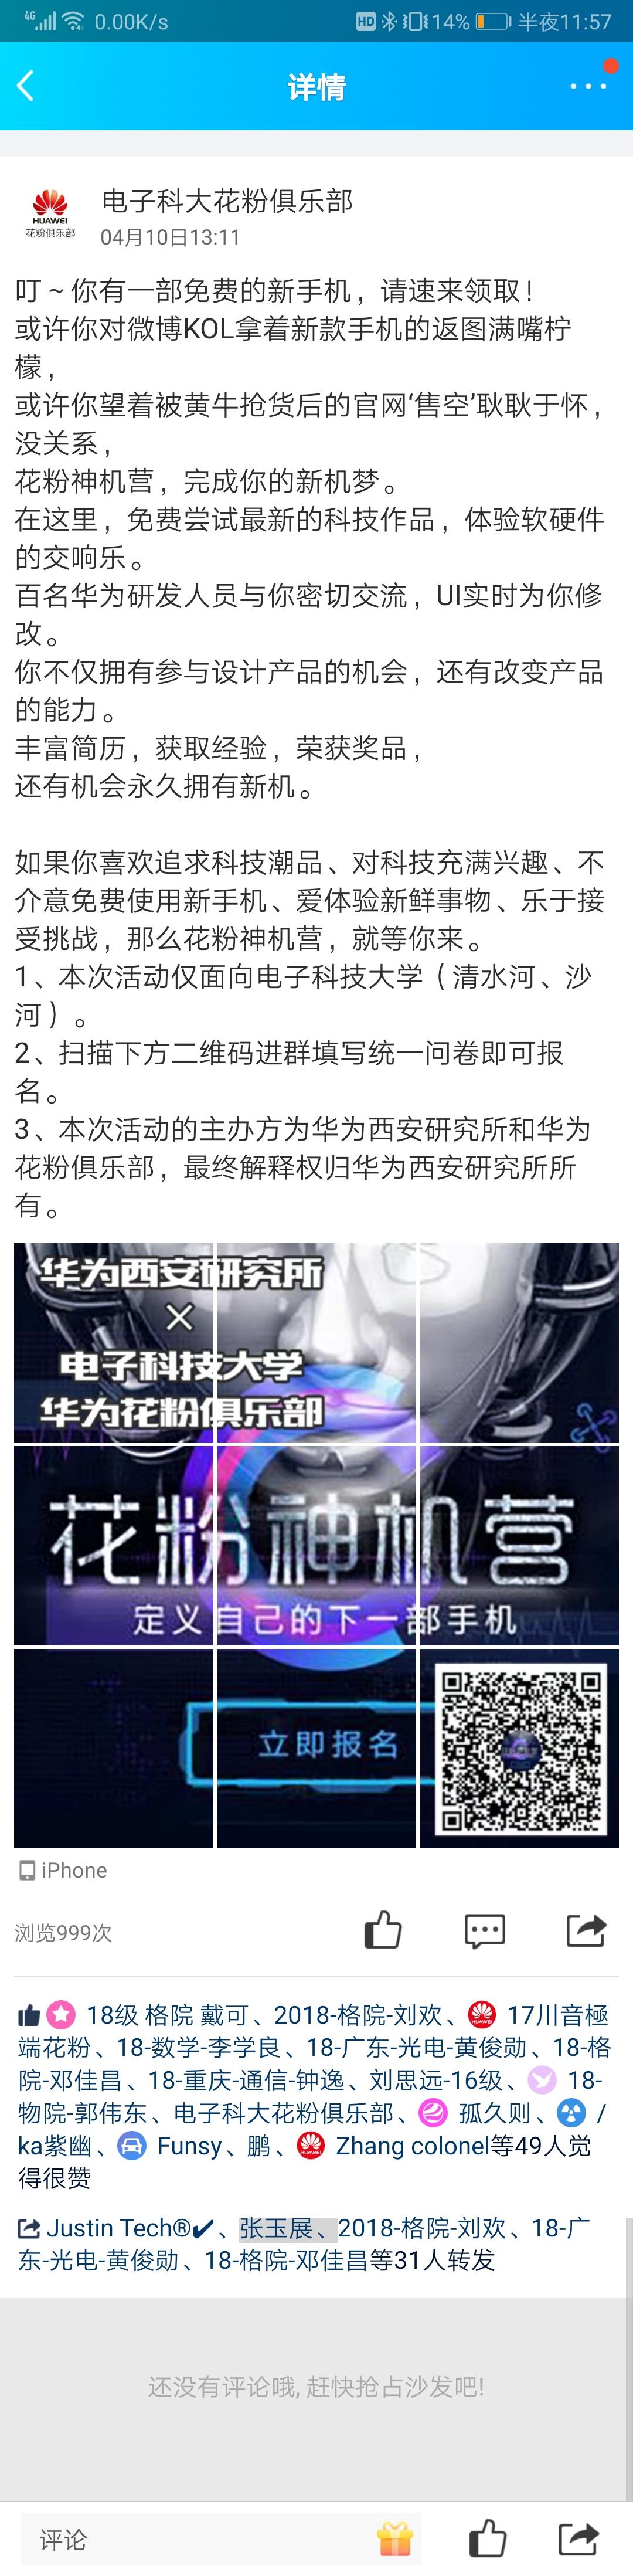 Screenshot_20190605_235724_com.tencent.mobileqq.jpg